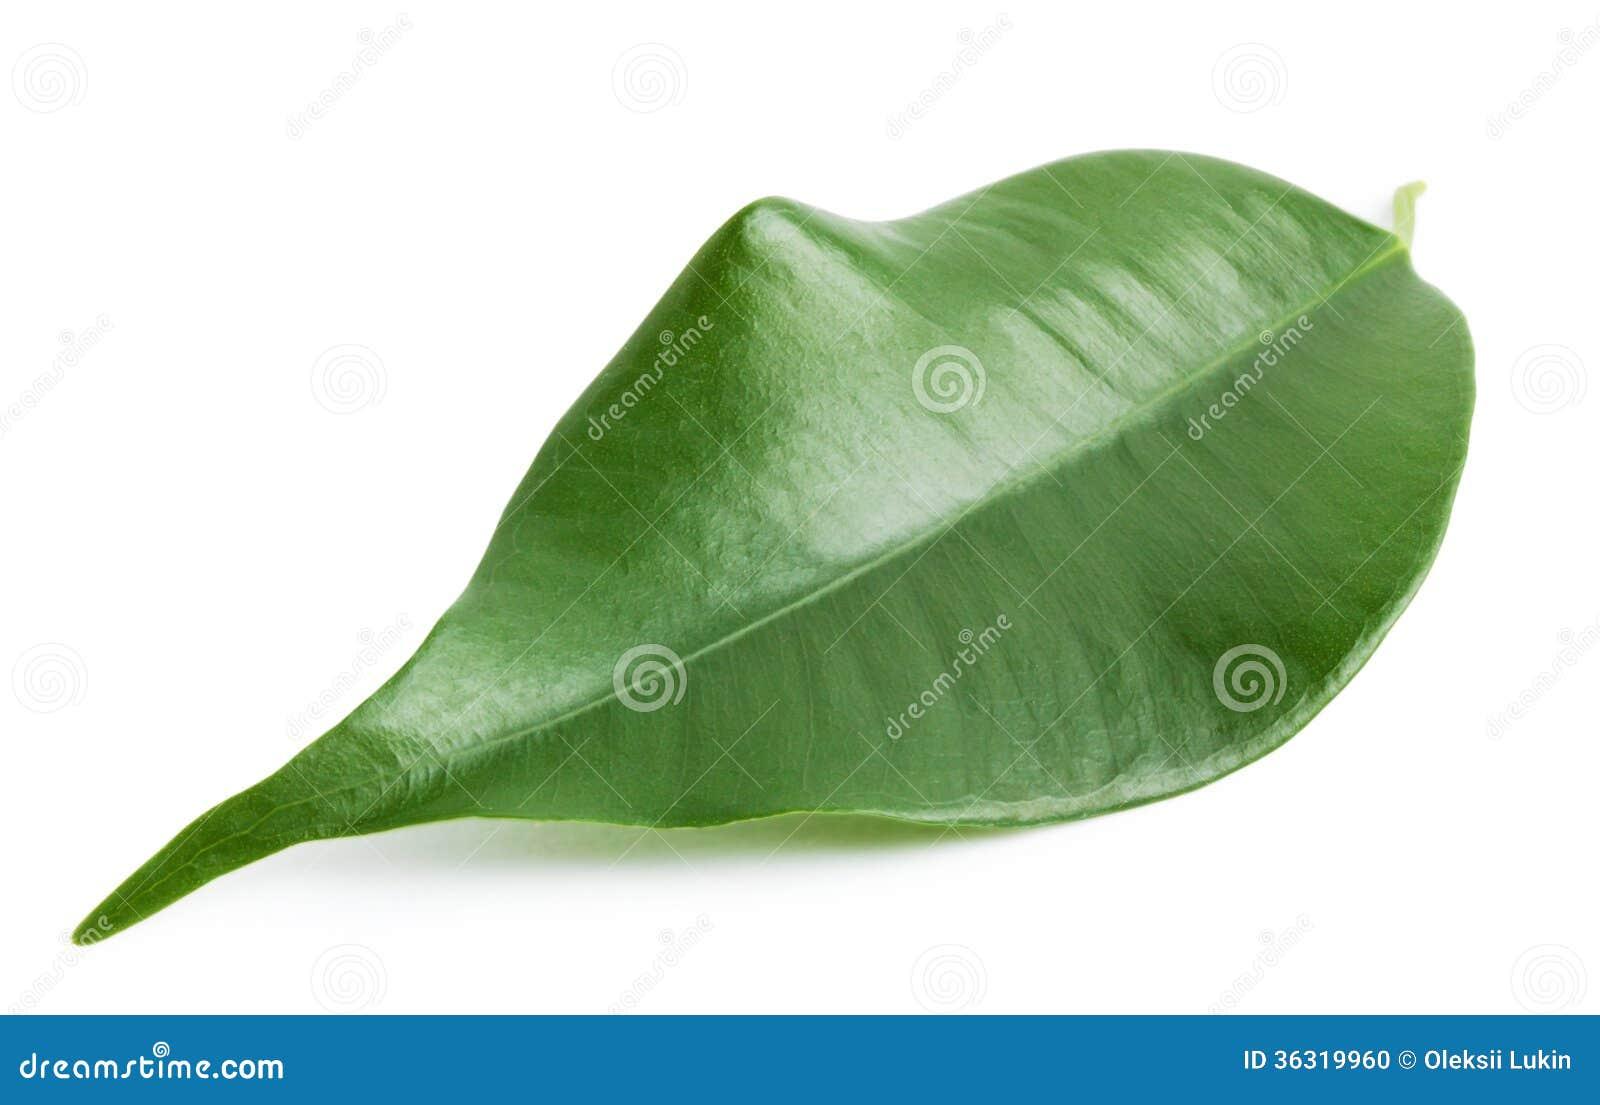 Green shiny orange leaf stock photo image 36319960 for Amber leaf